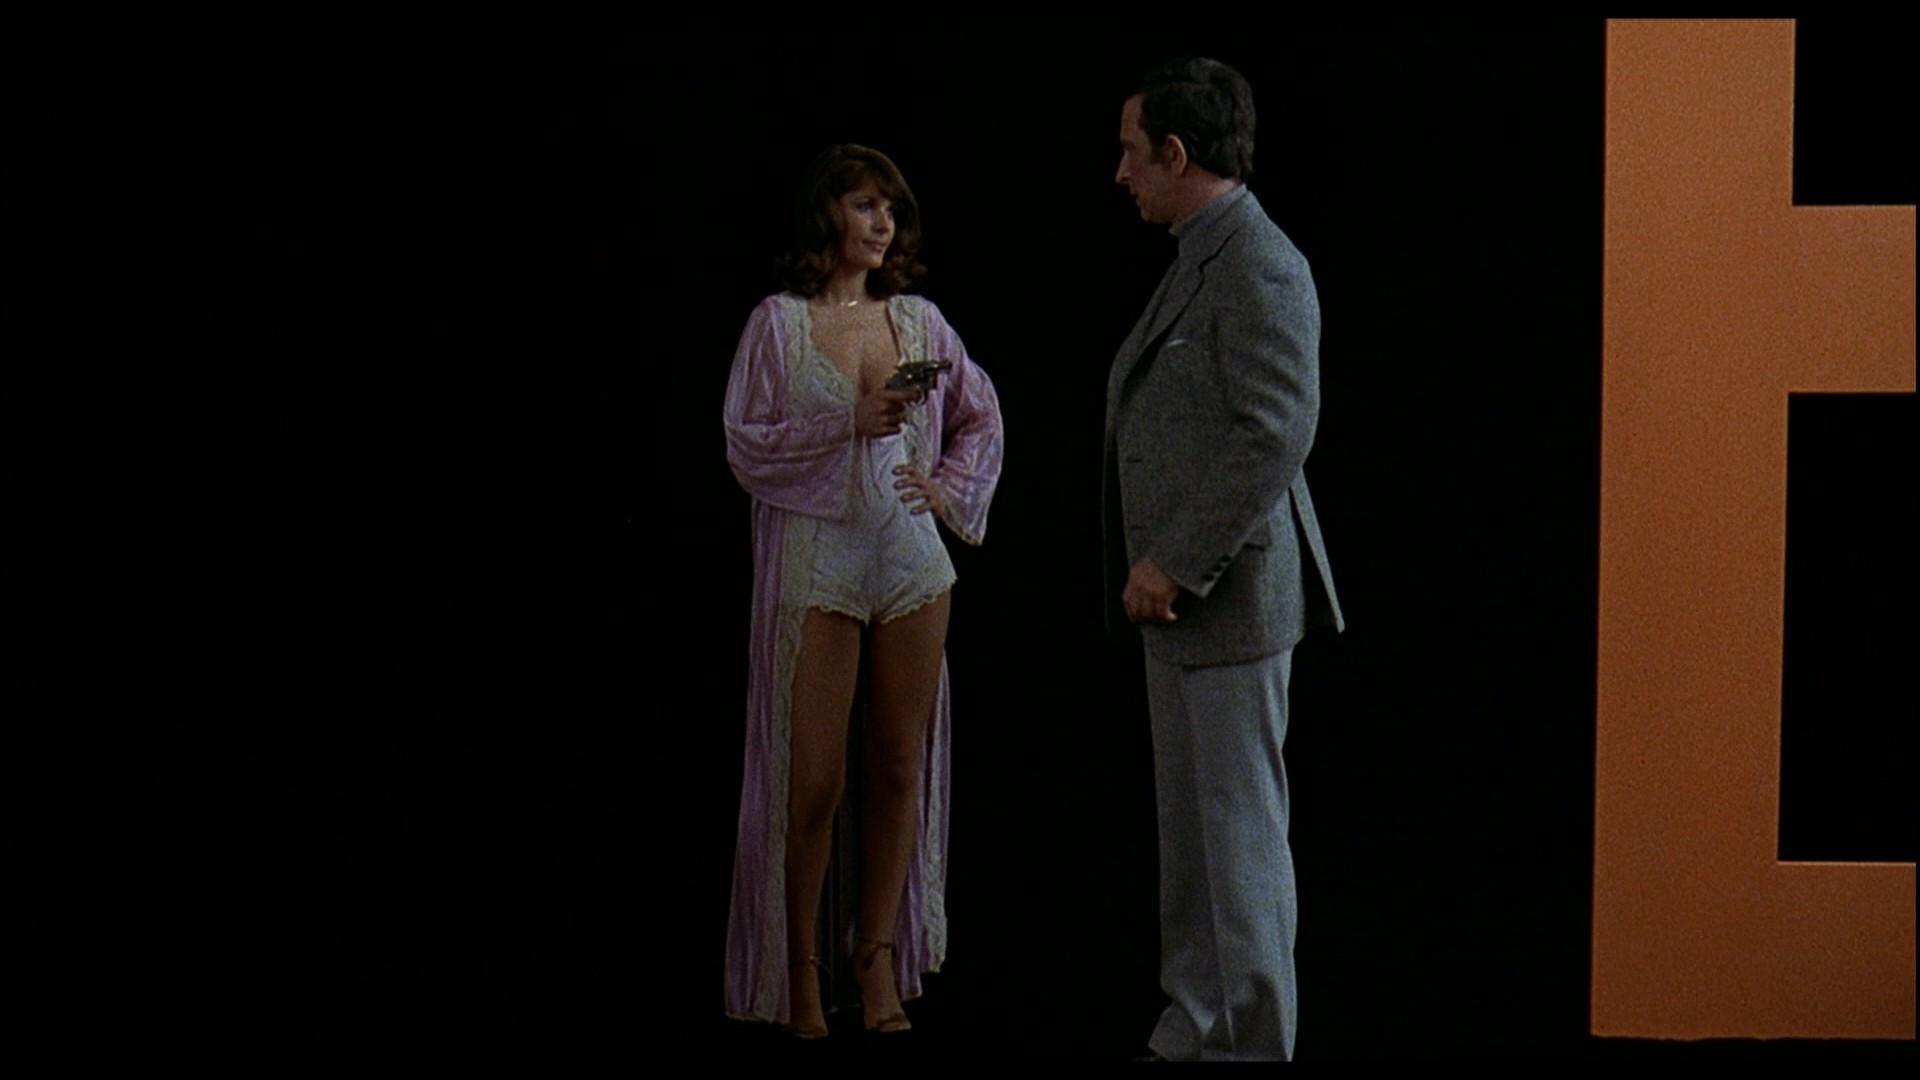 Cheré Bryson busty see through Andrea Howard, Pamela Hensley hot - The Nude Bomb (1980) HD 1080p BluRay (10)